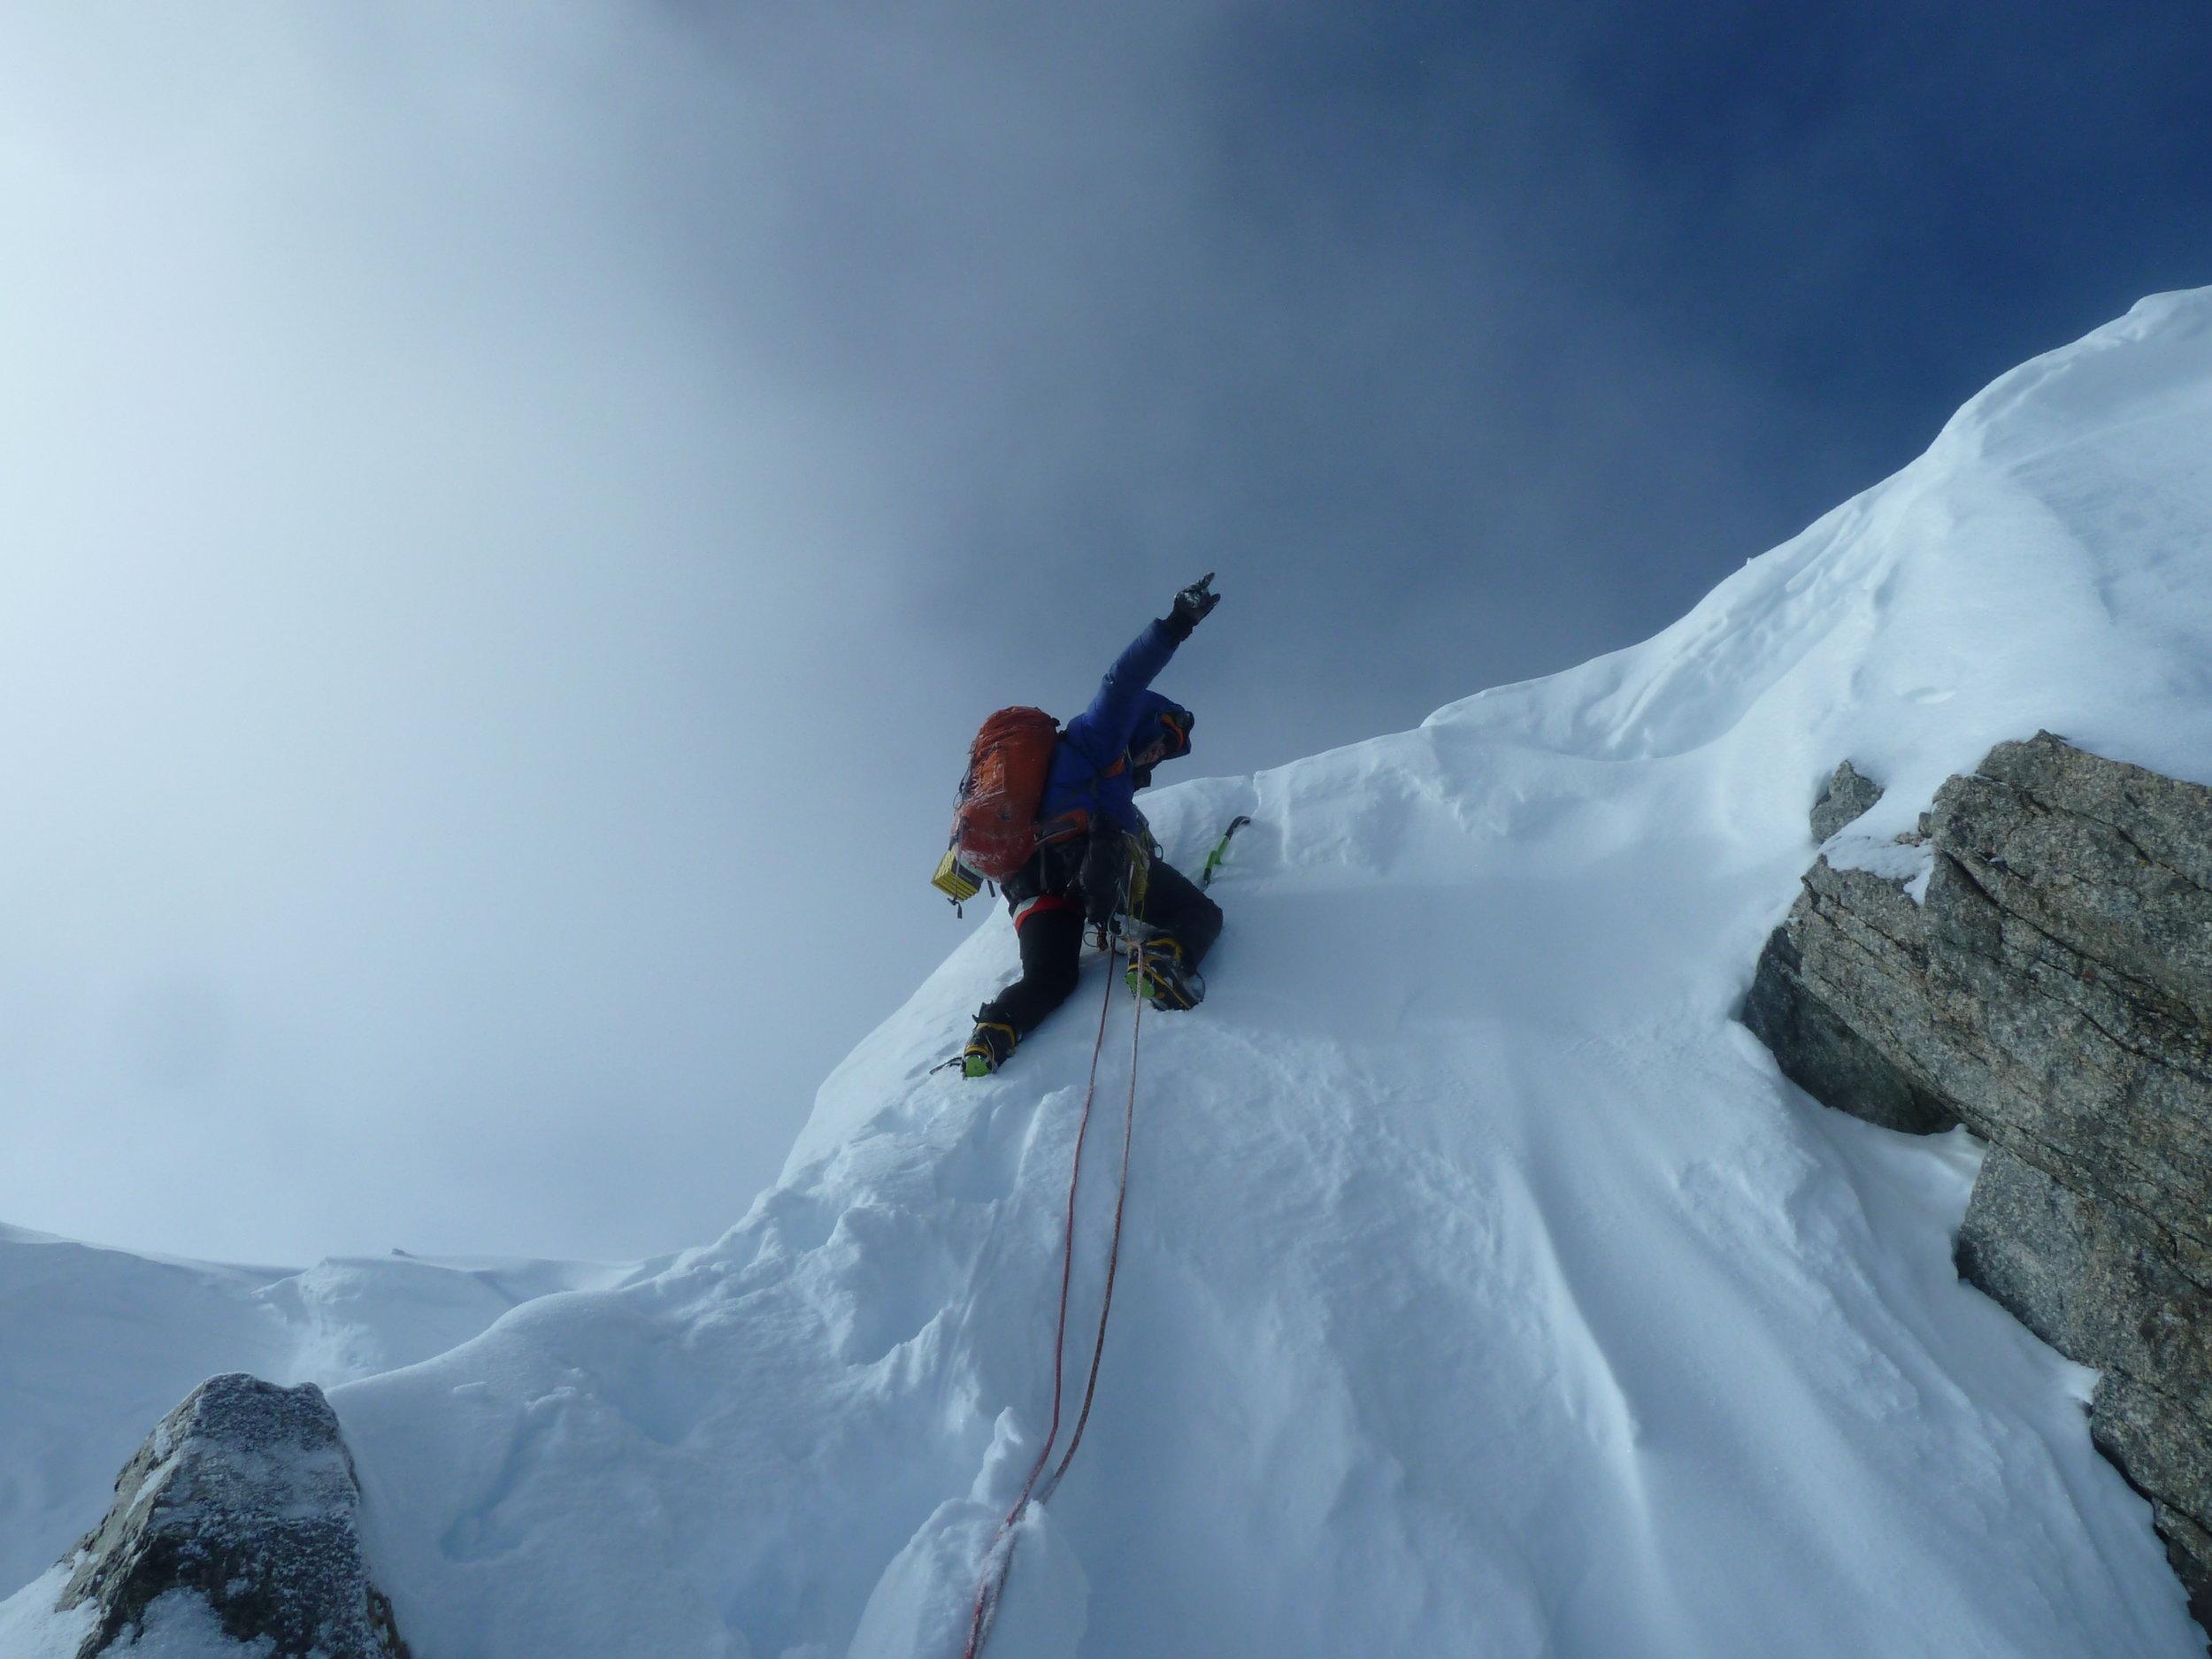 Pete Graham tops out after a winter ascent of the Walker Spur, Grandes Jorasses.